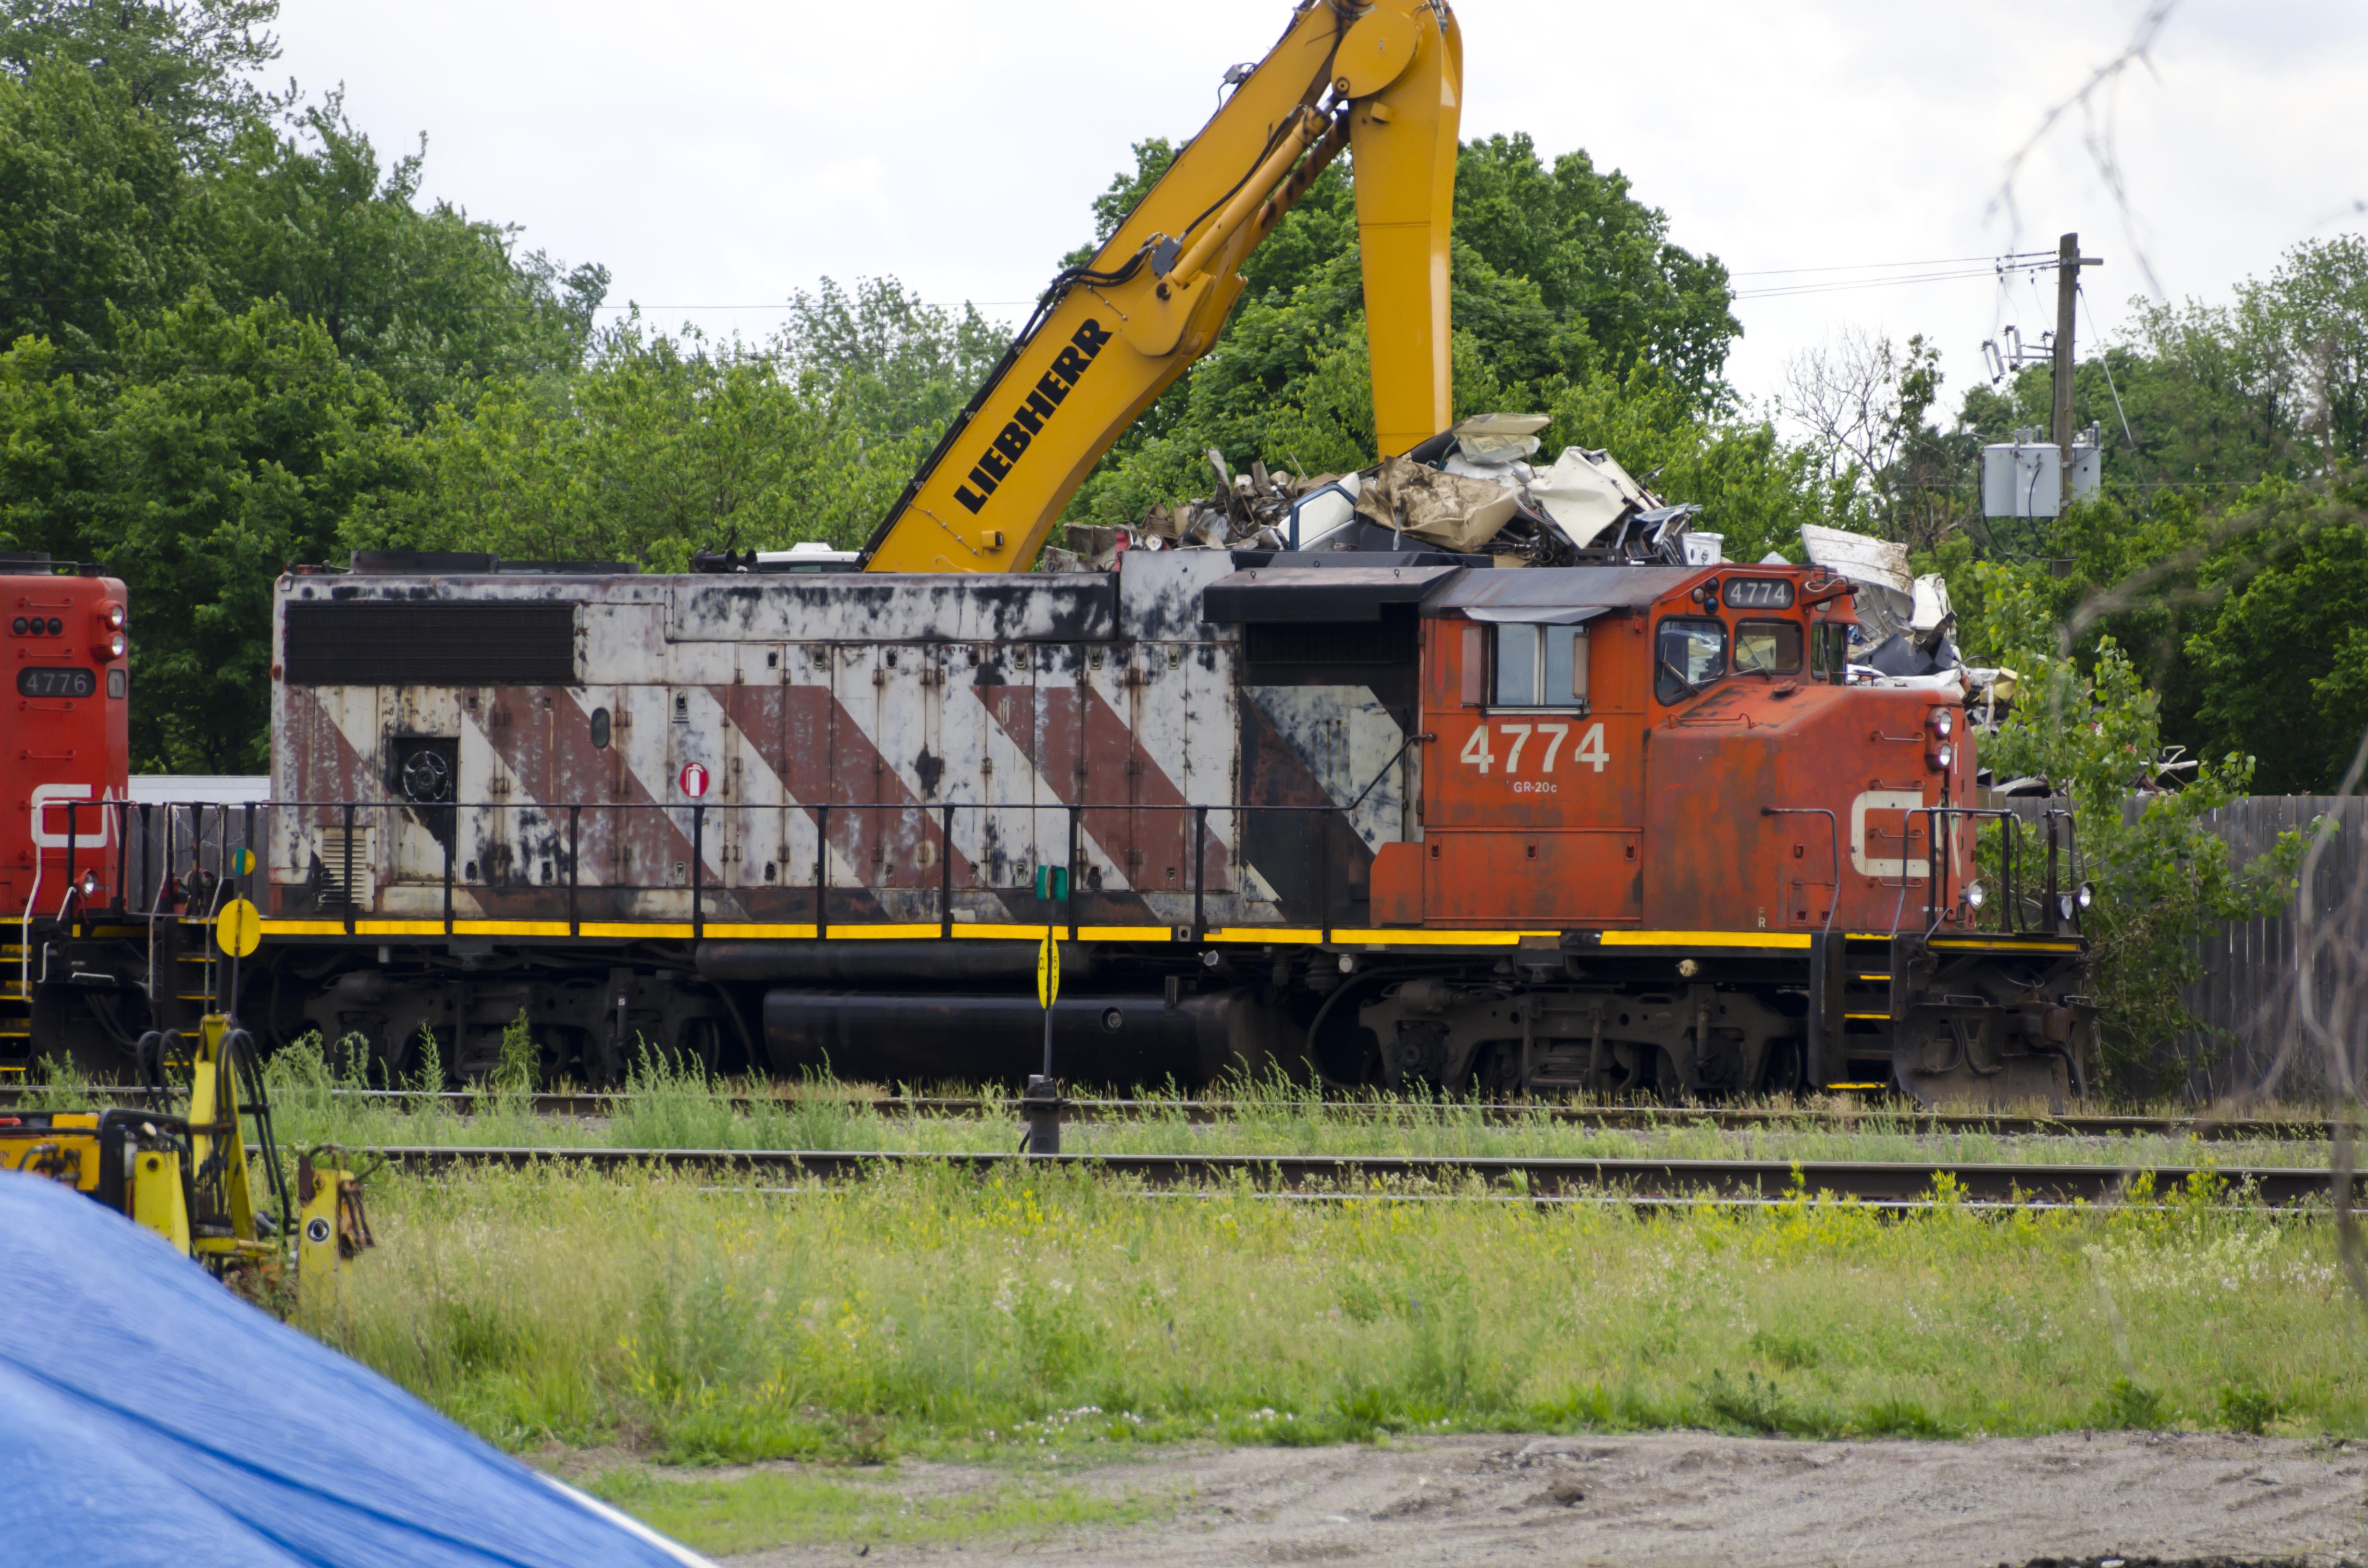 Canadian National Railway CN #4774 EMD GP38-2W diesel locomotive photo (2 Jun 2012) London ON Canada